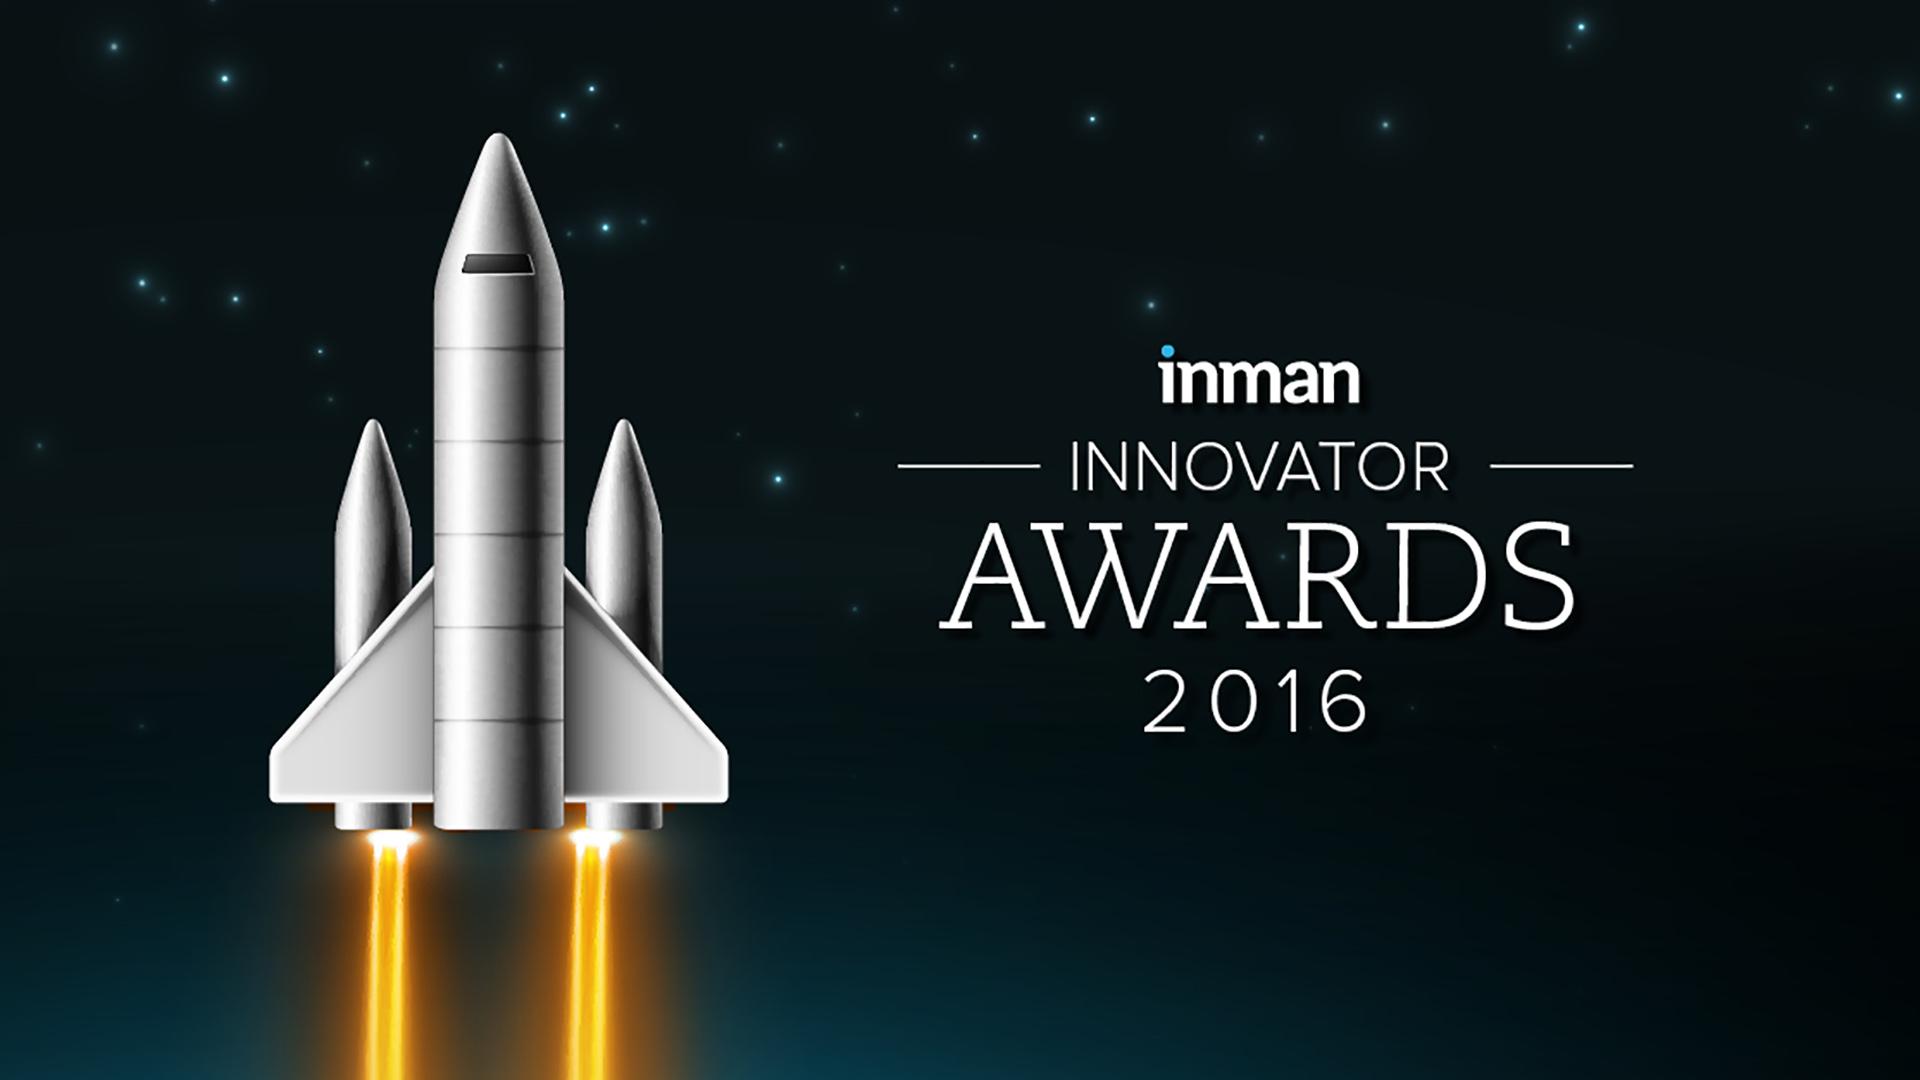 Inman Innovator Awards 2016 | Innovator of the Year | Realty Austin